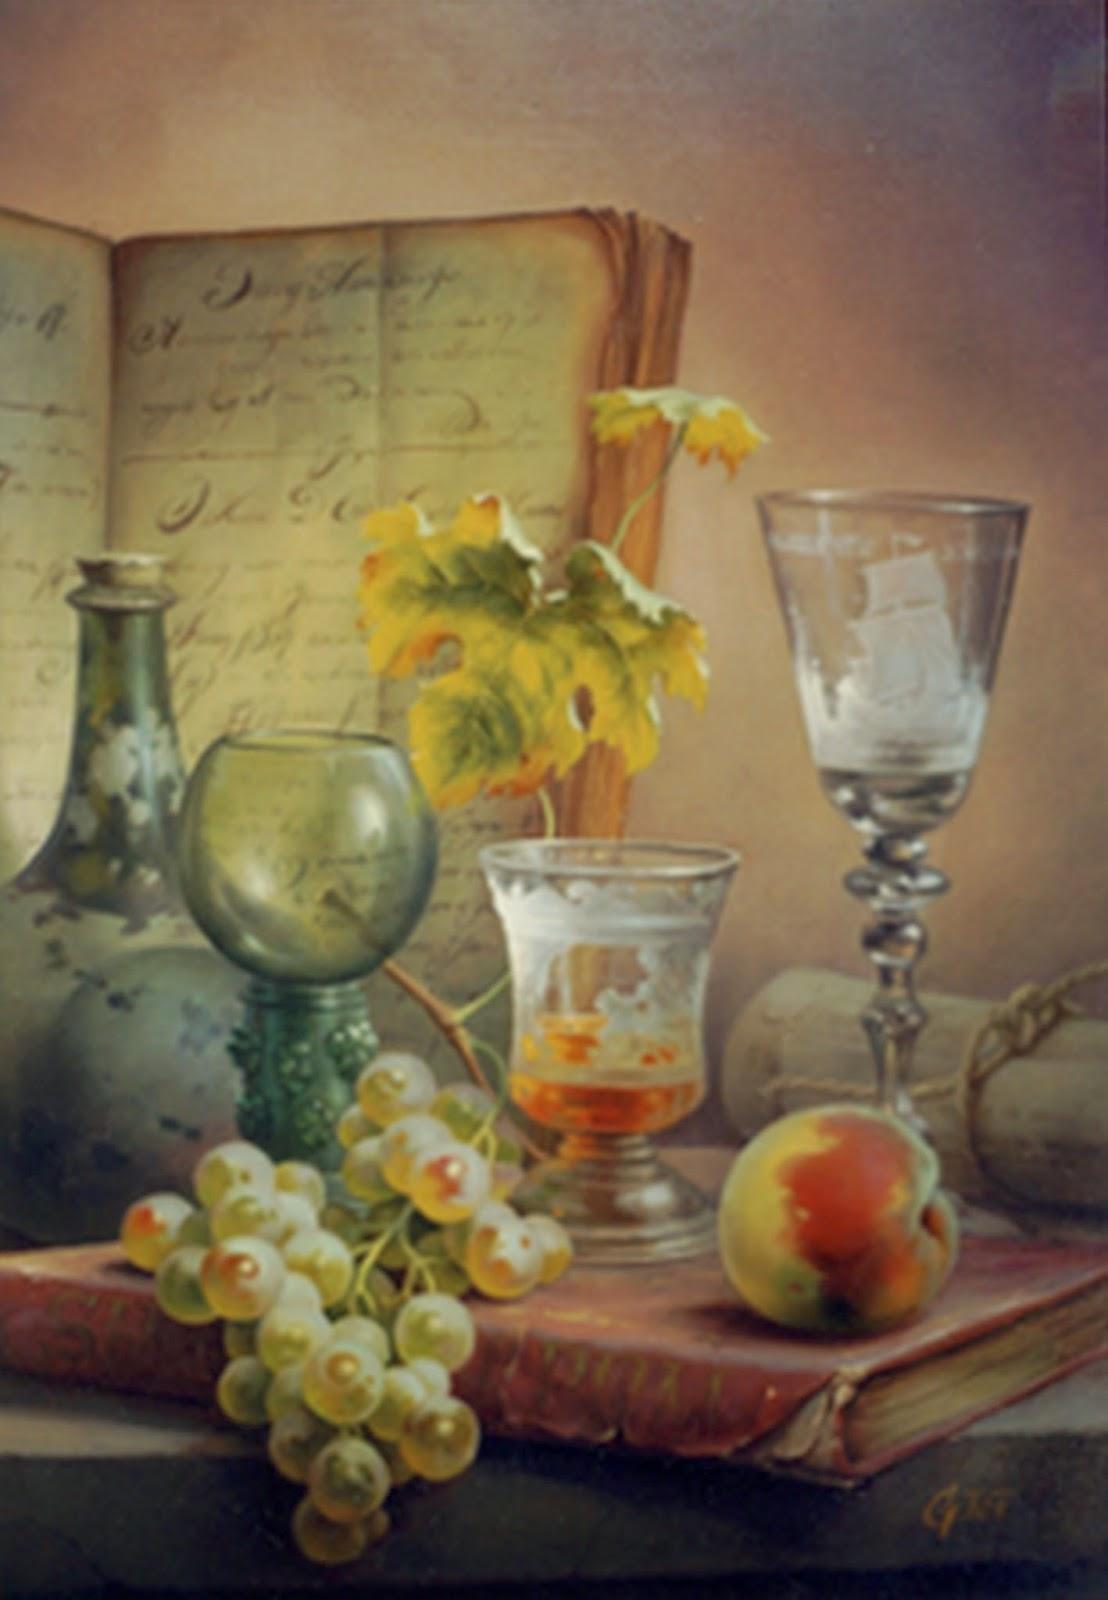 imagenes-bodegones-clasicos-de-frutas-al-oleo